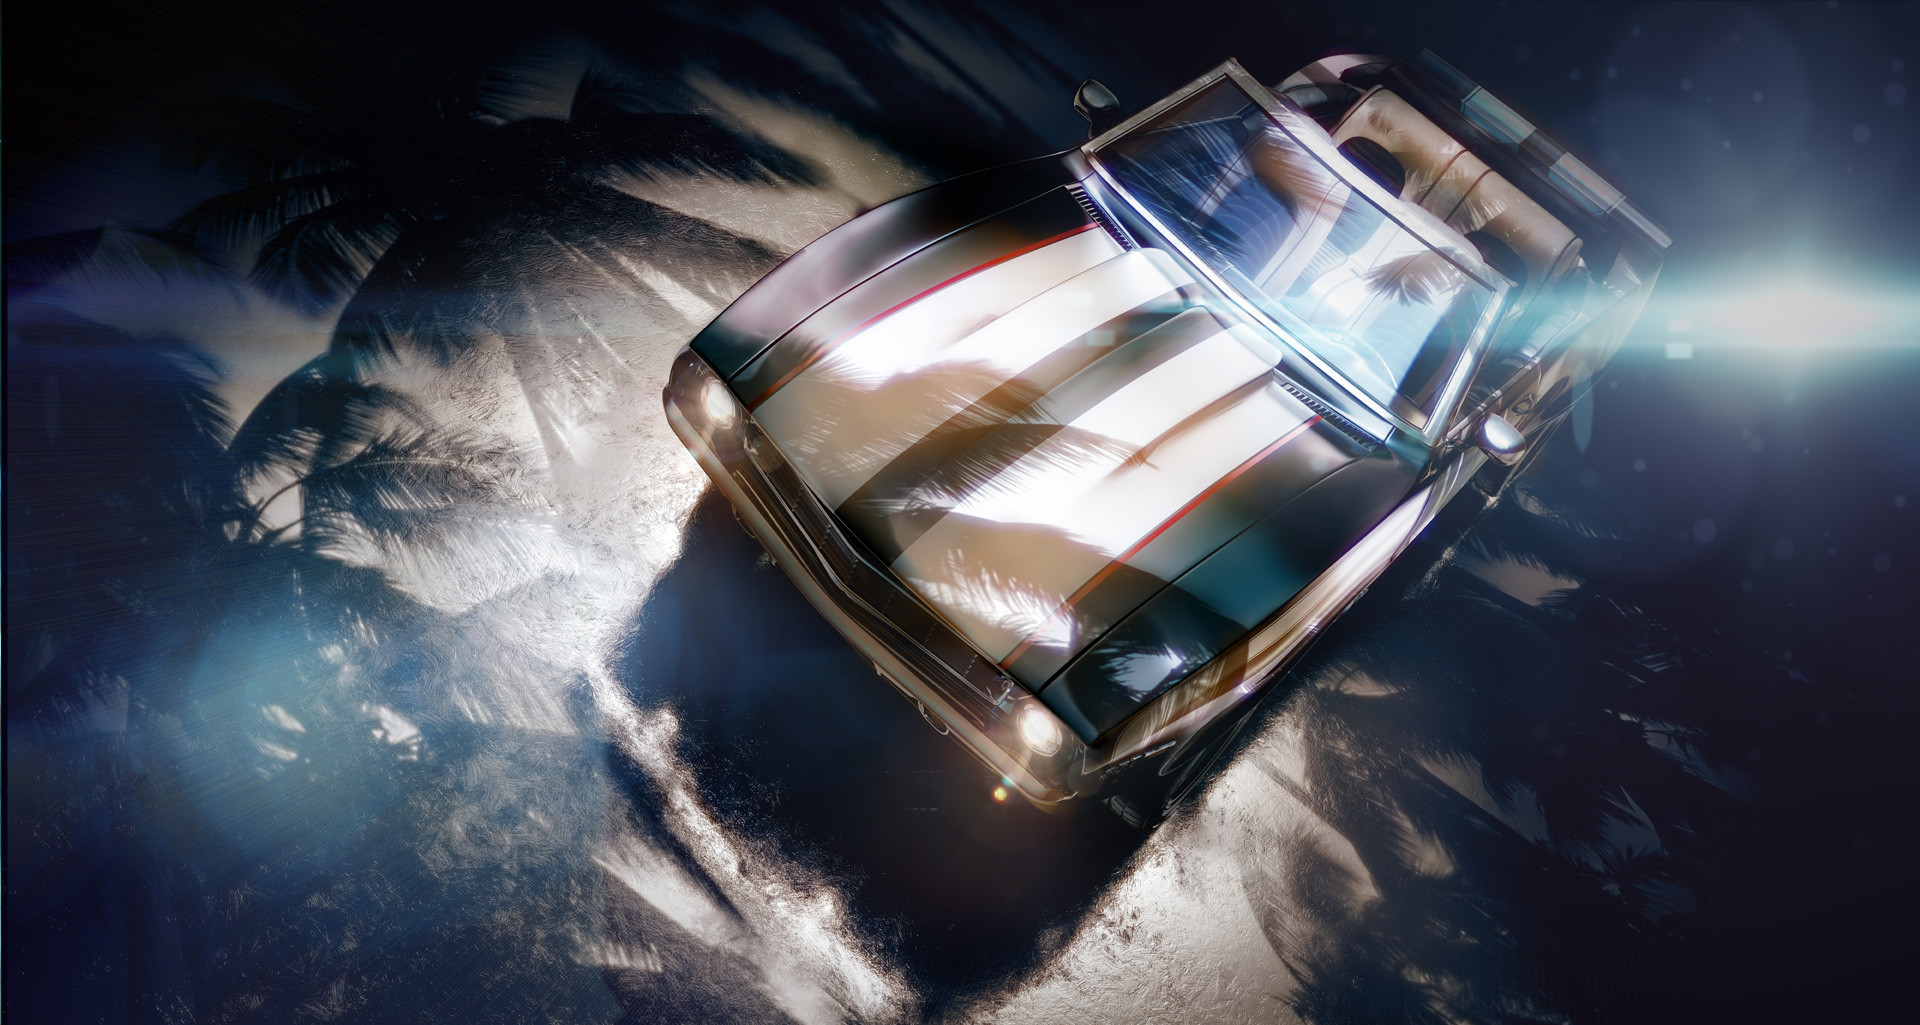 camaro02_1920.jpg